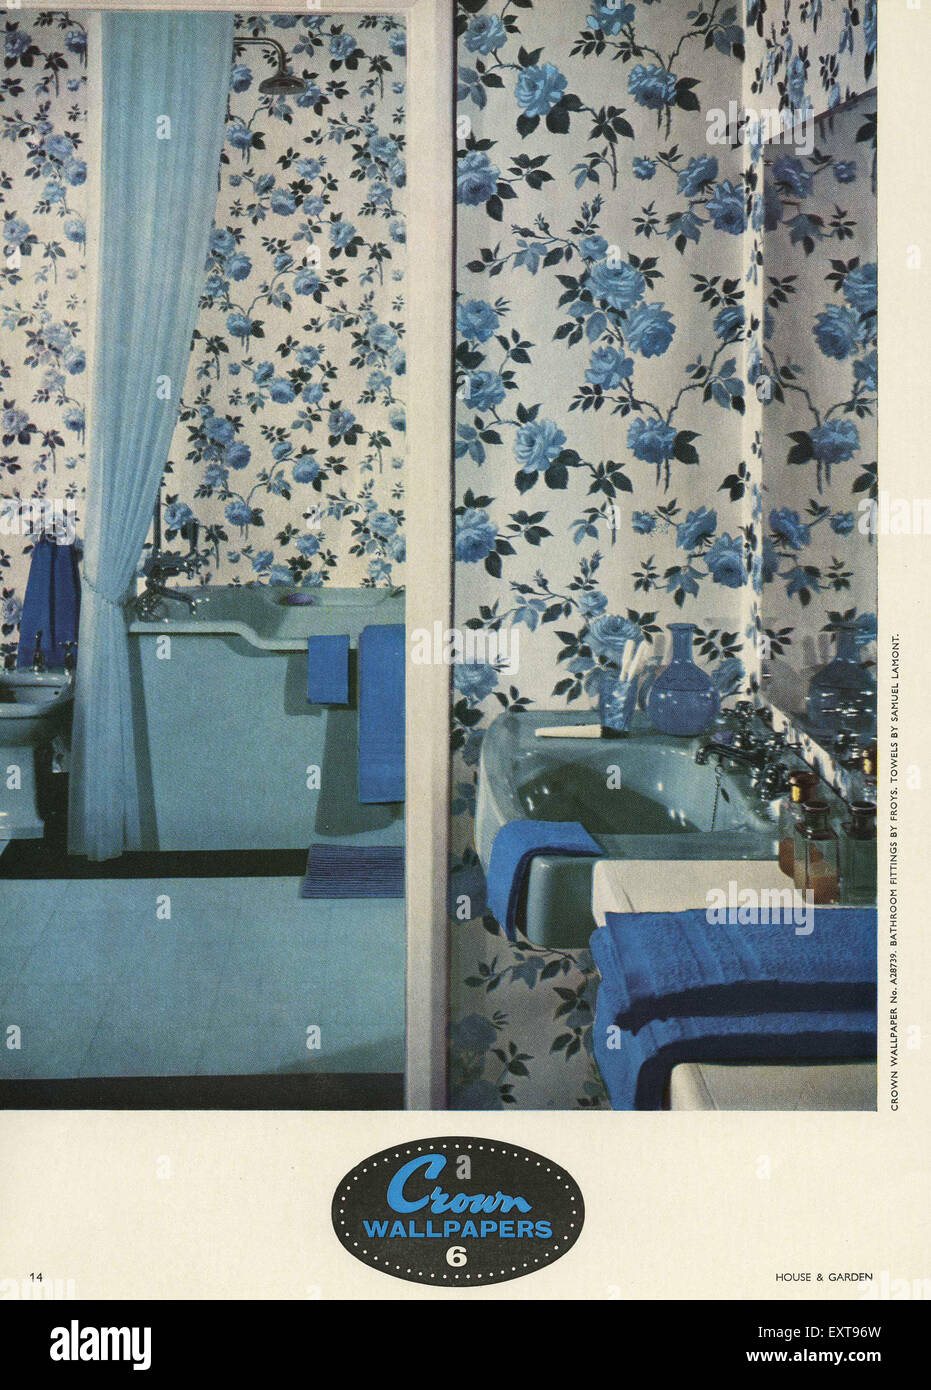 1950s Uk Crown Magazine Advert Stock Photo 85356625 Alamy